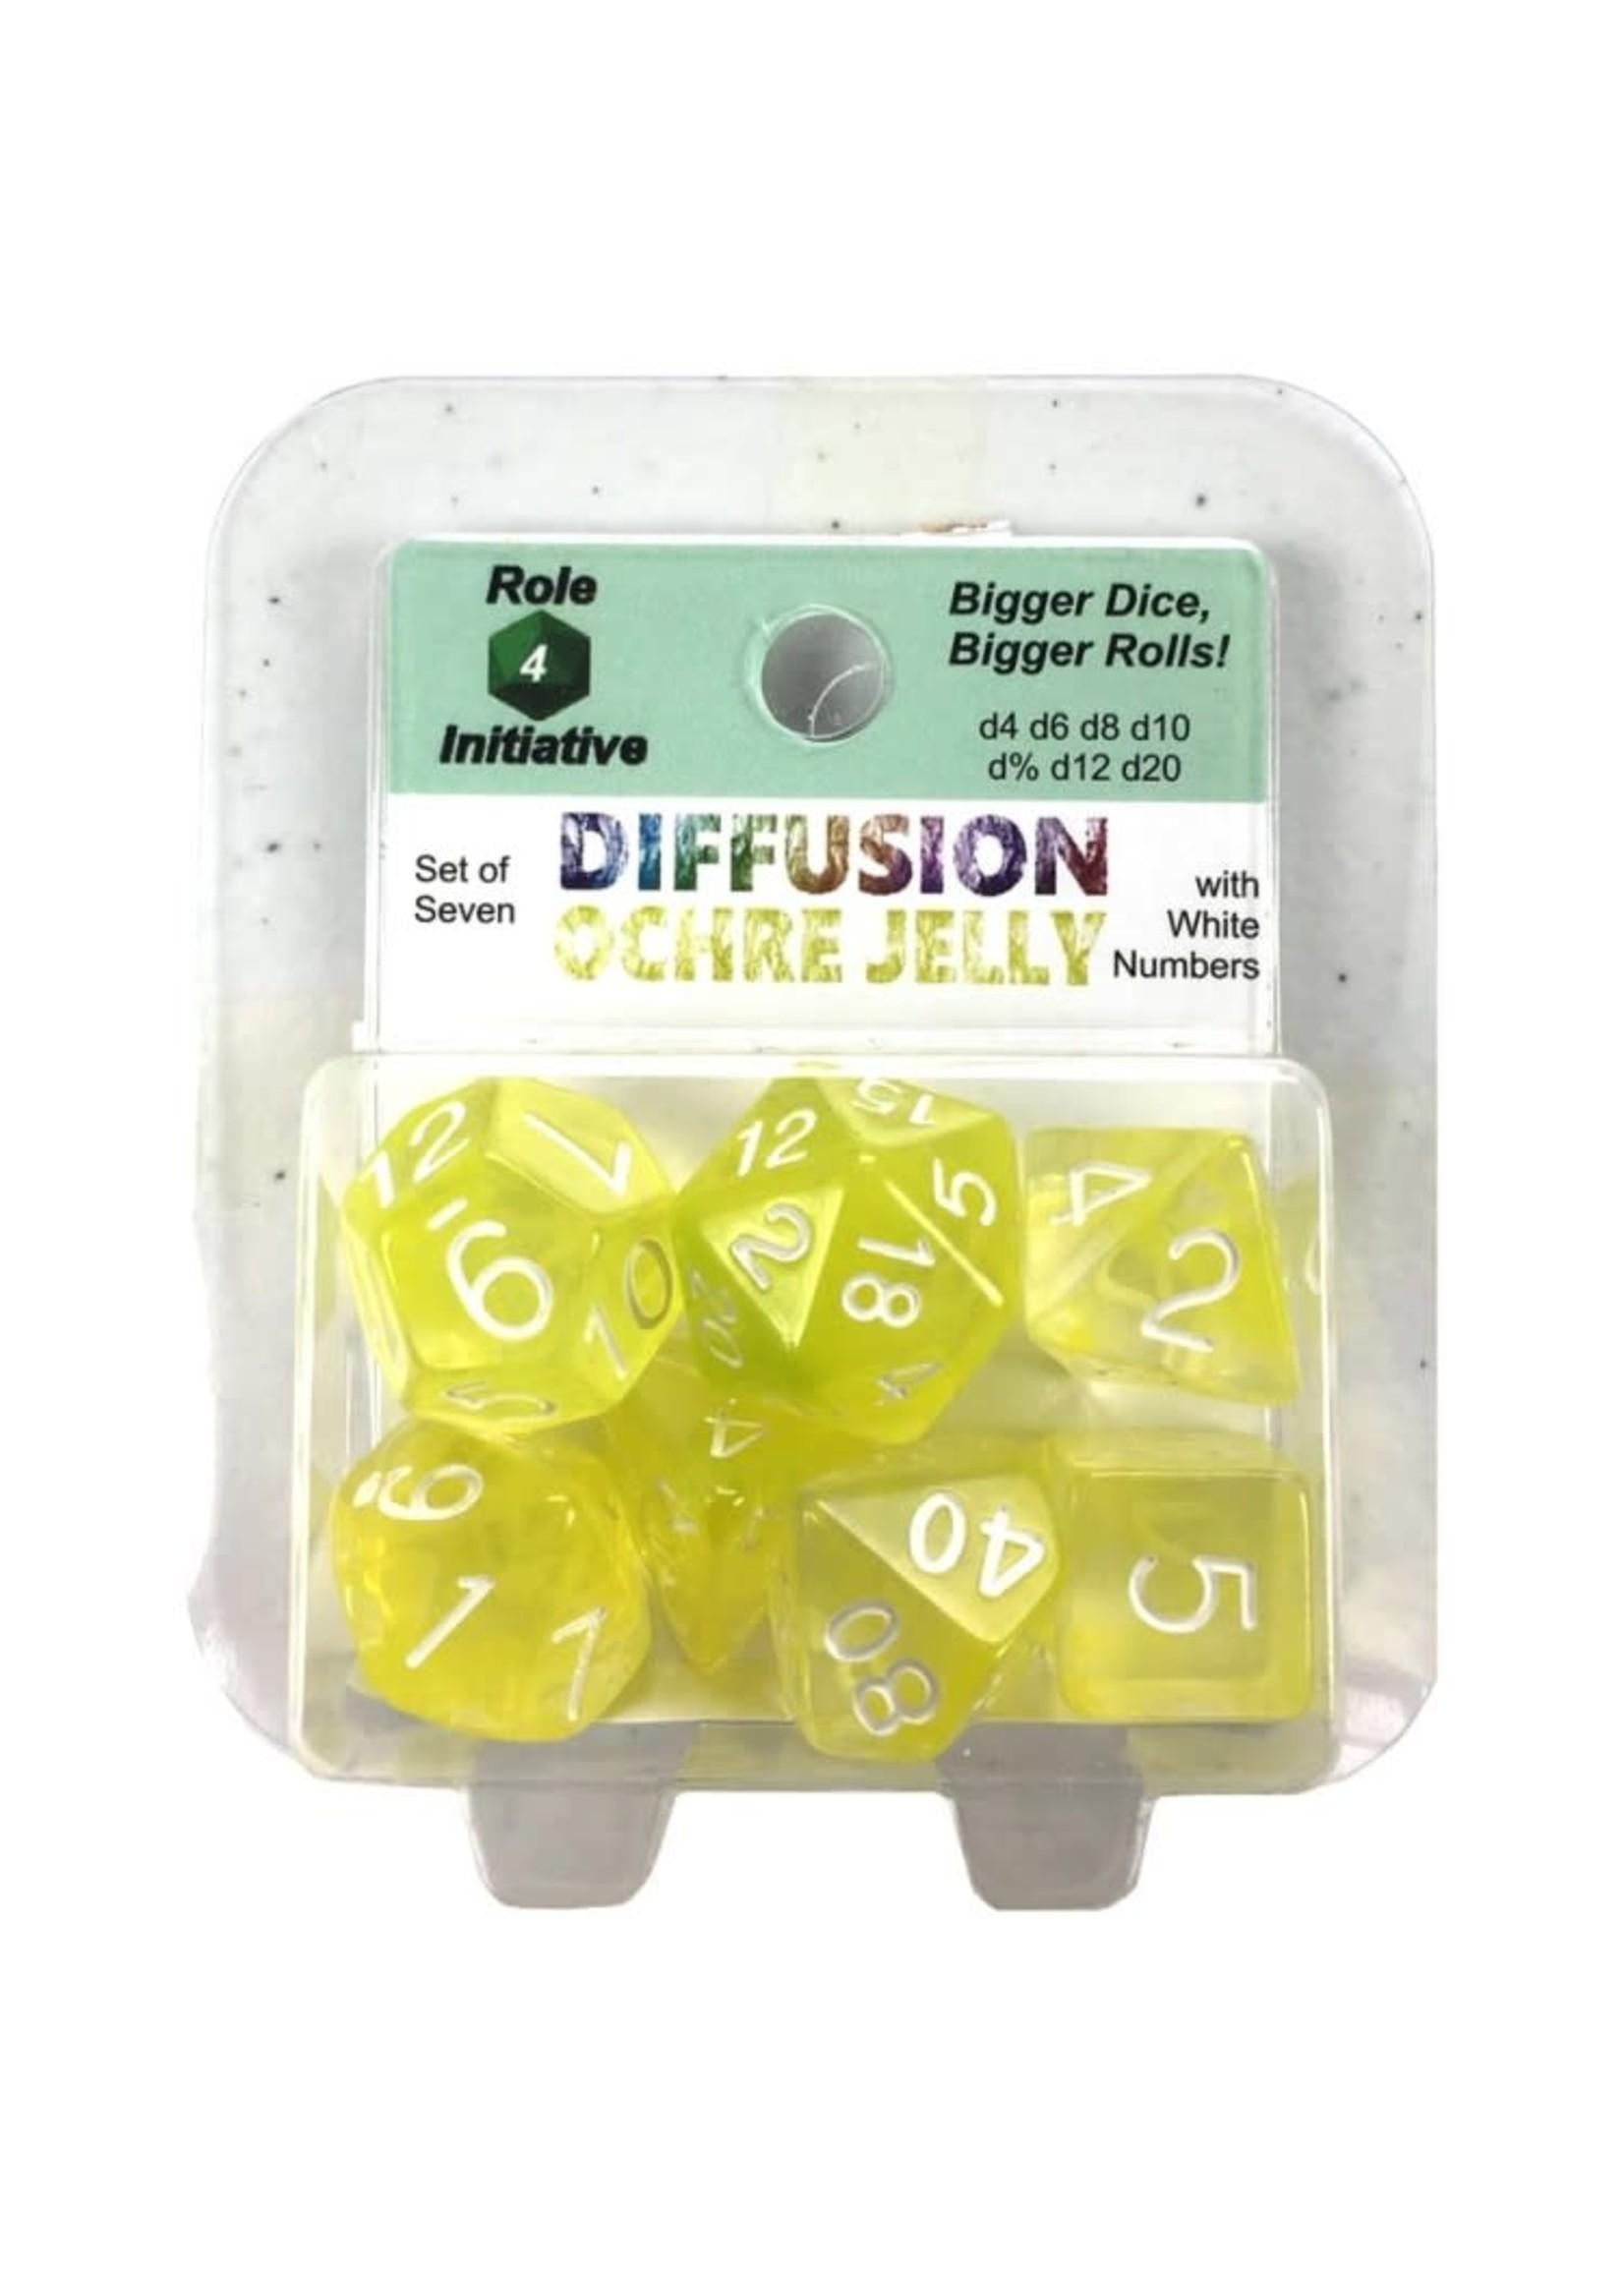 ROLE 4 INITIATIVE 7-set Diffusion OCHRE JELLYwh